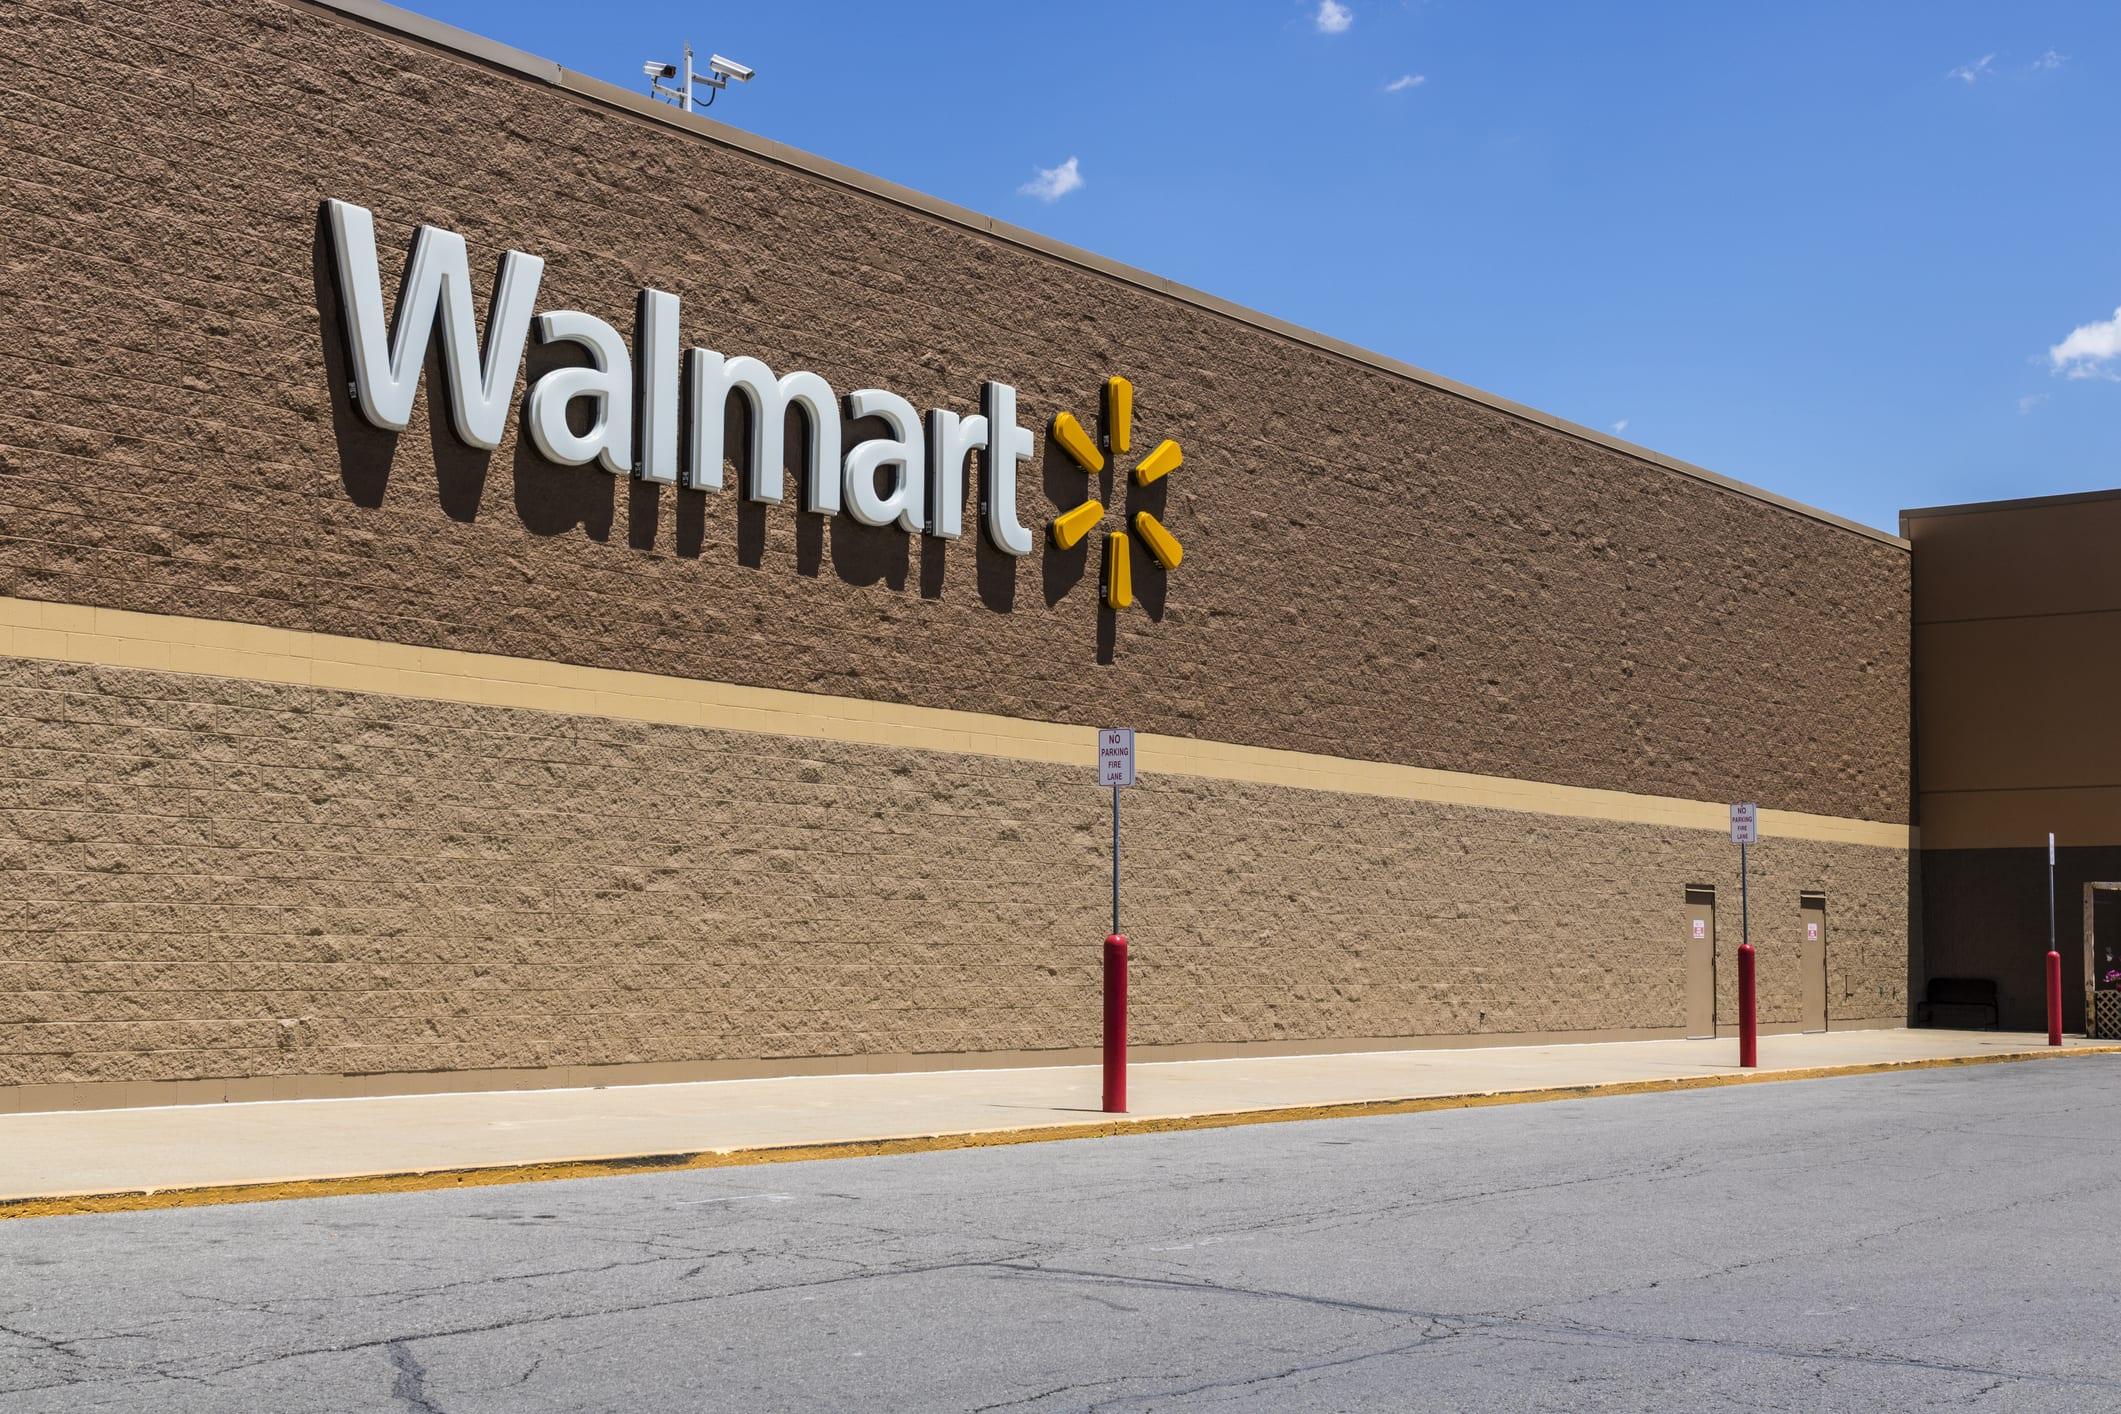 Walmart sign on building